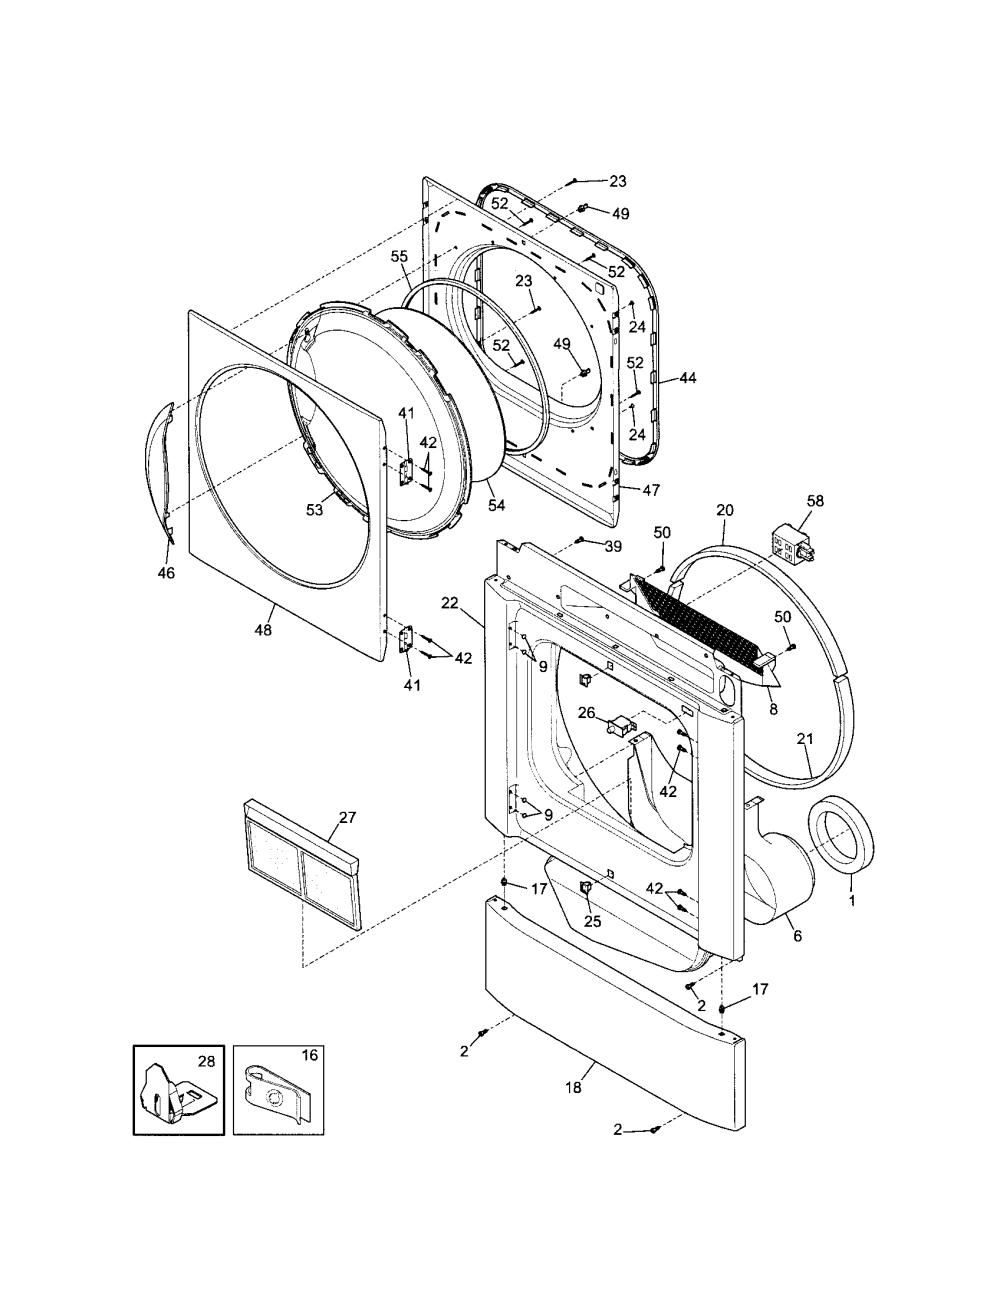 medium resolution of kenmore 41798052700 front panel lint filter diagram